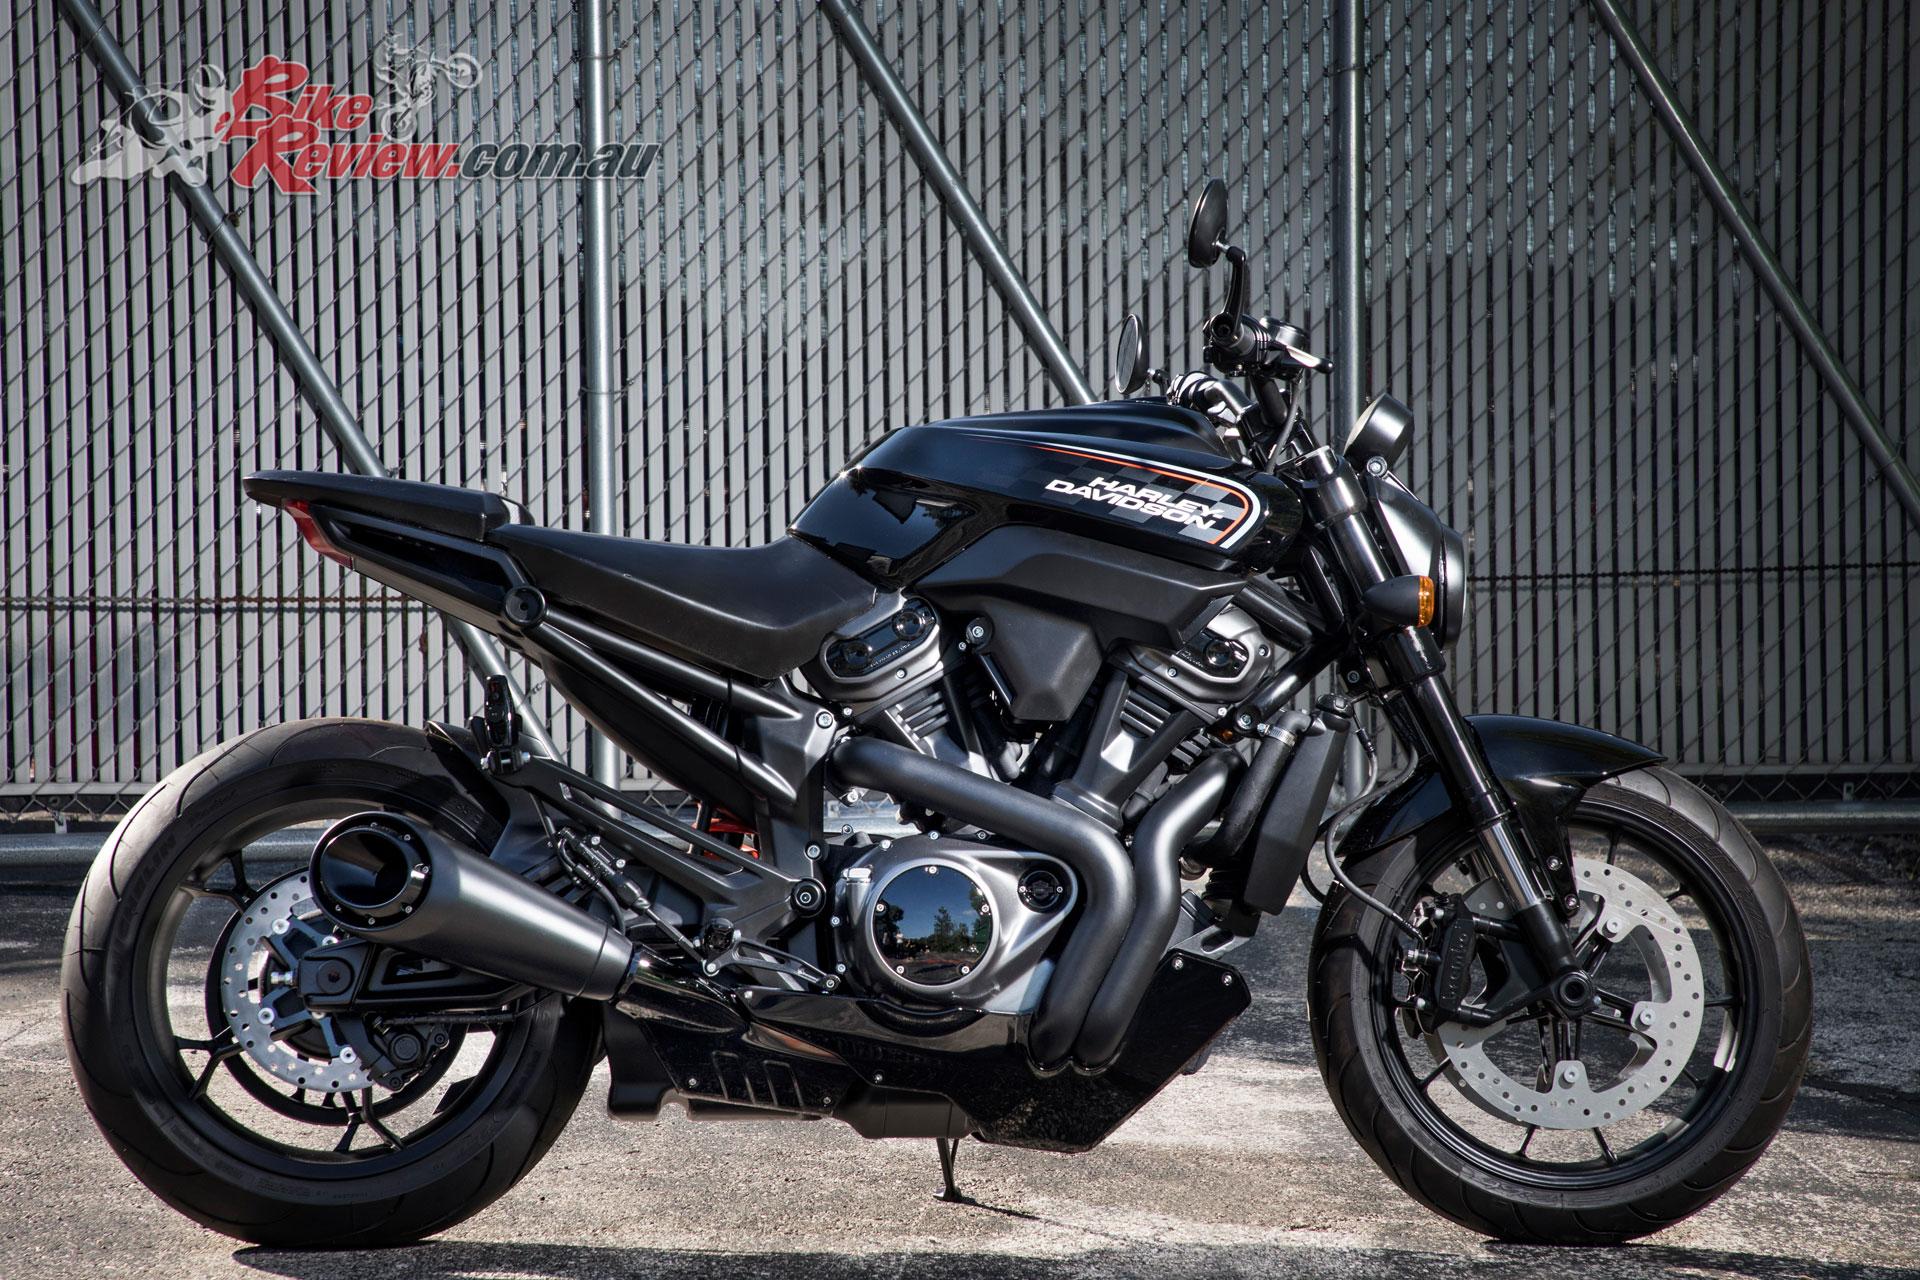 Harley-Davidson Future Streetfighter Model